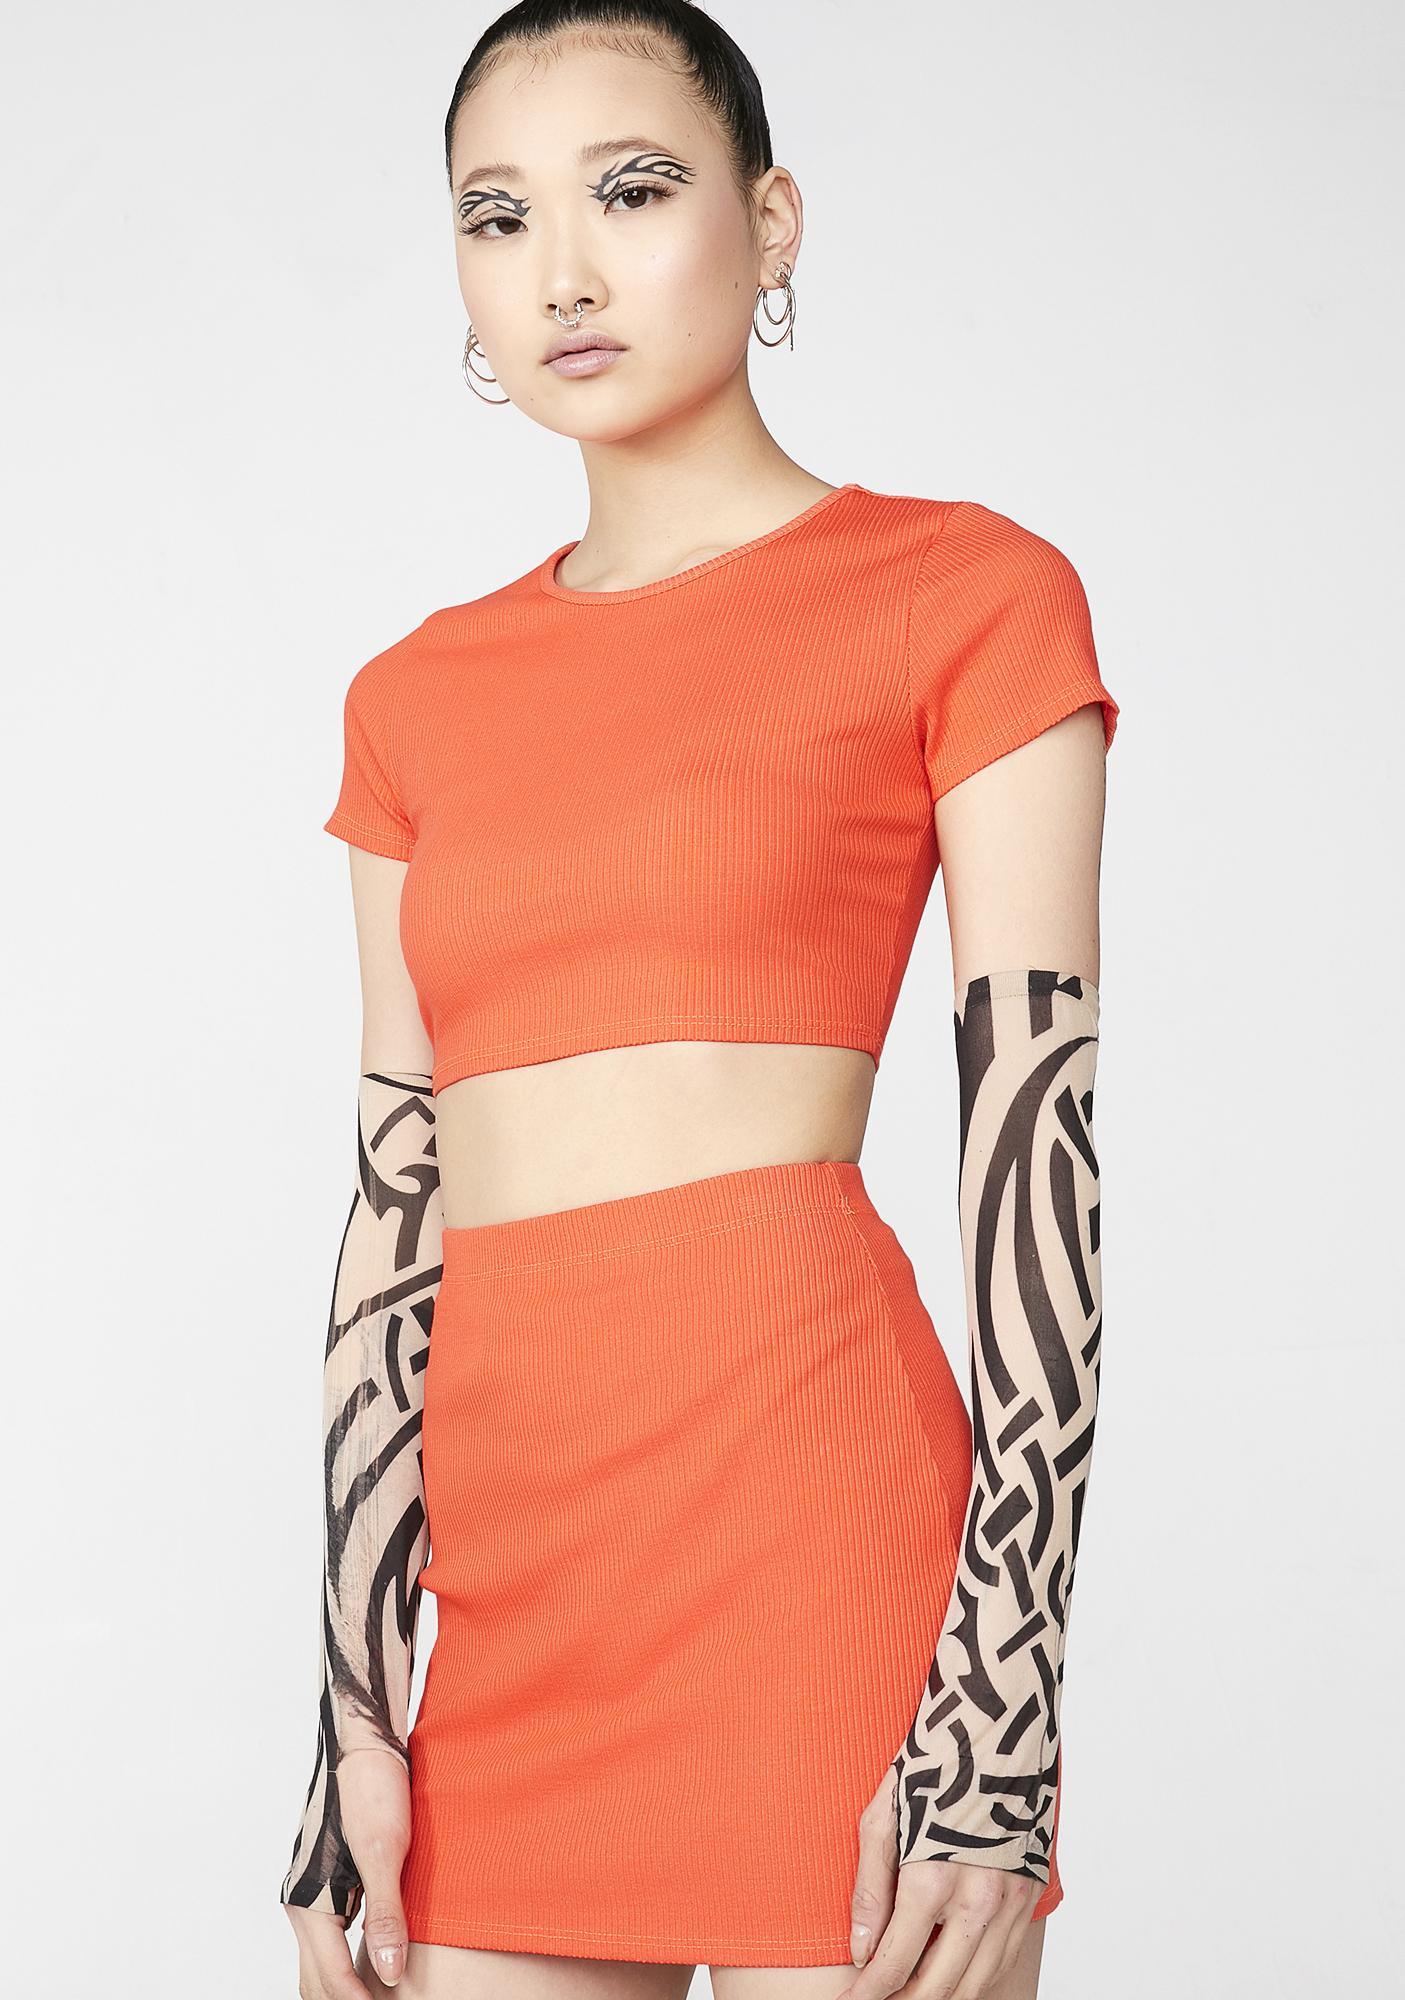 Glow Gang Skirt Set